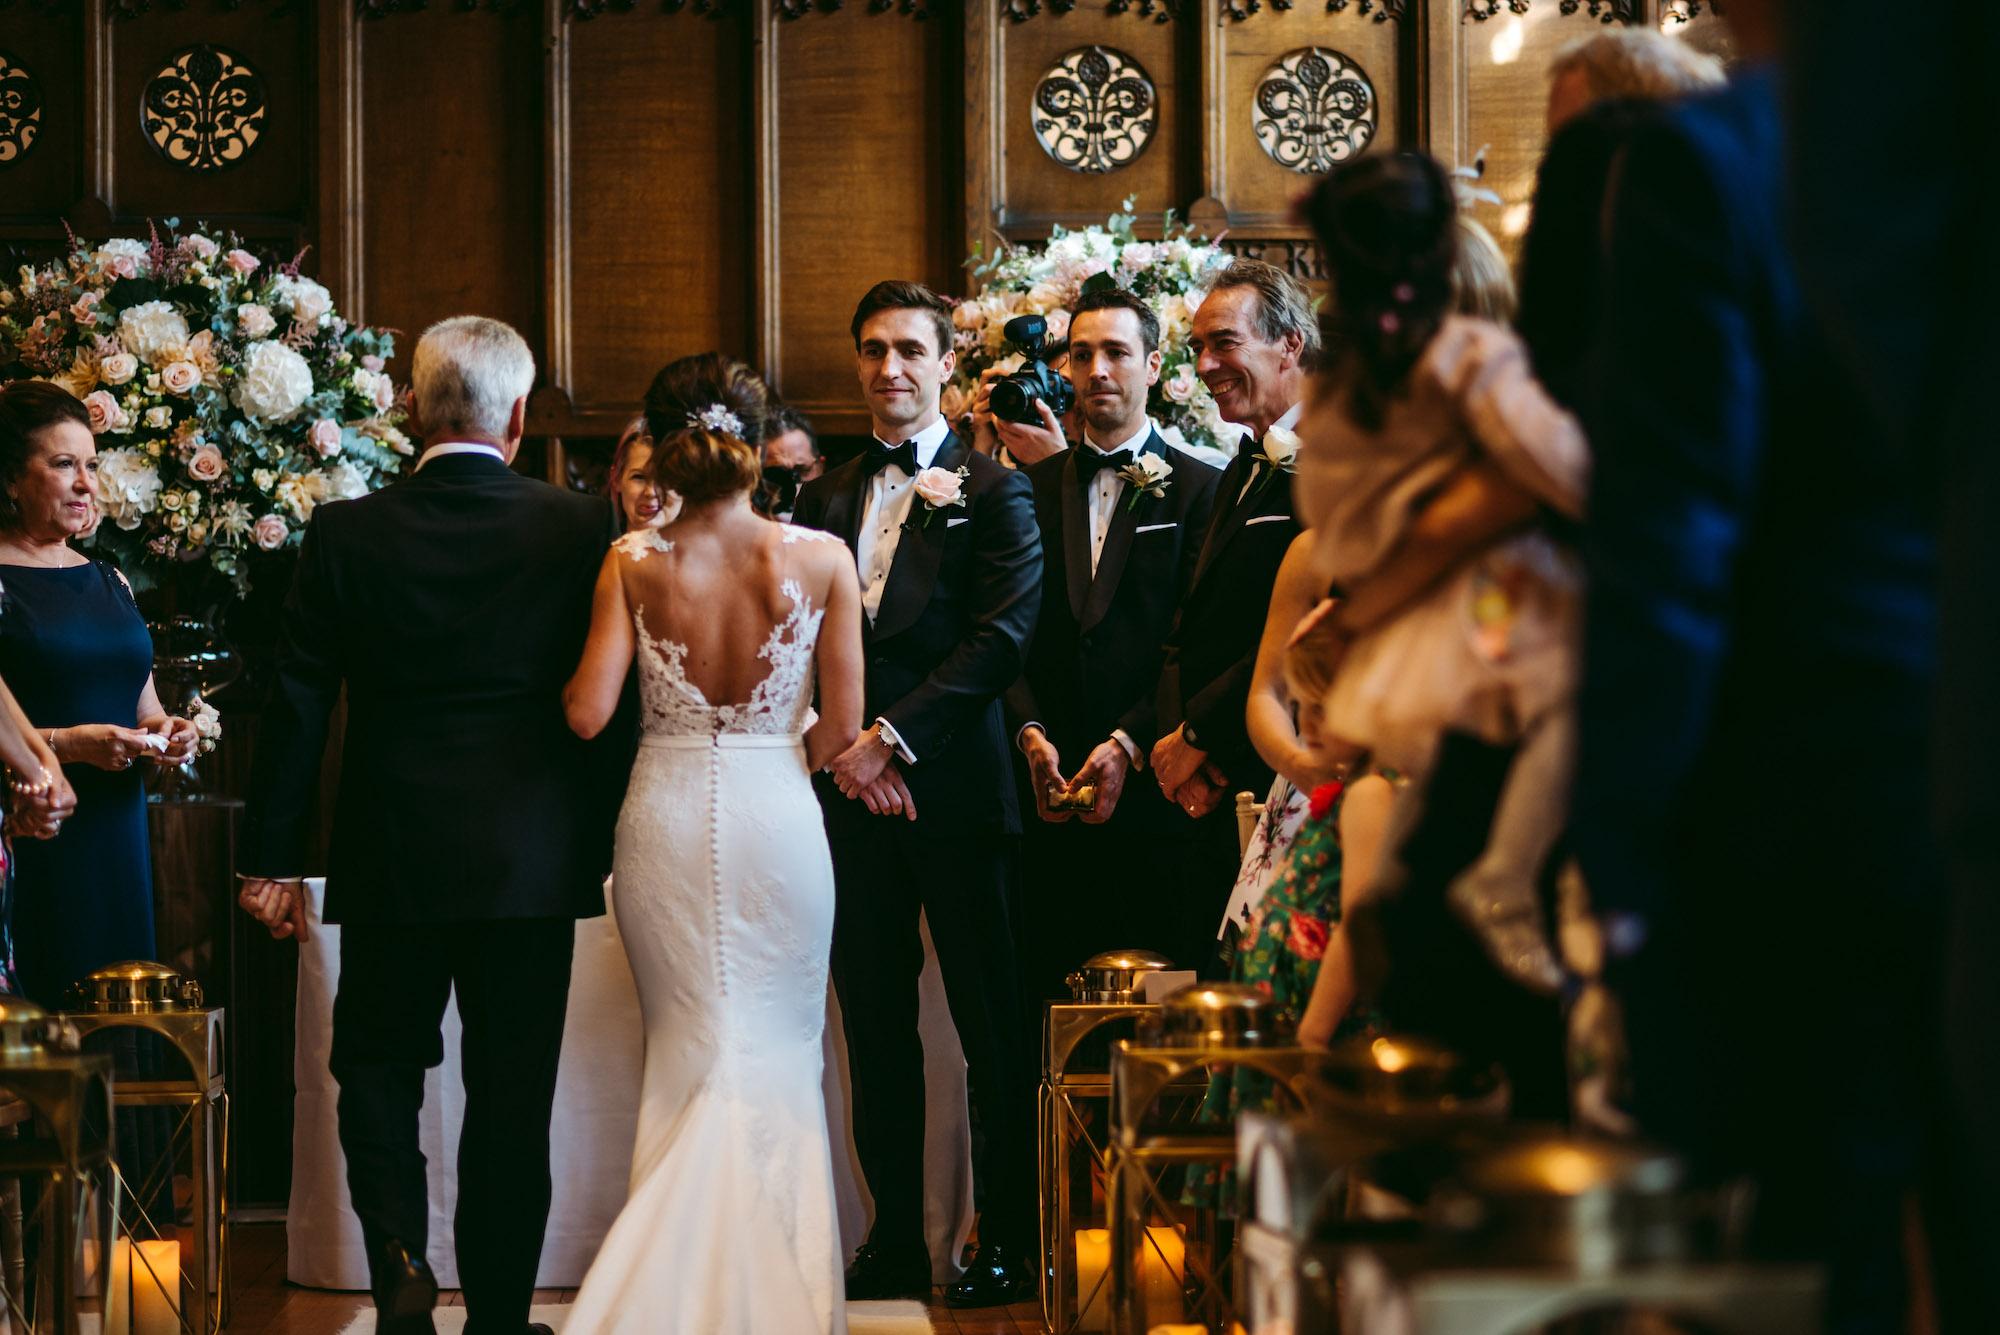 37   Hengrave Hall Wedding   Suffolk Wedding   Lamare London   Luxury Wedding Planner   Jon Mold Photography.jpg